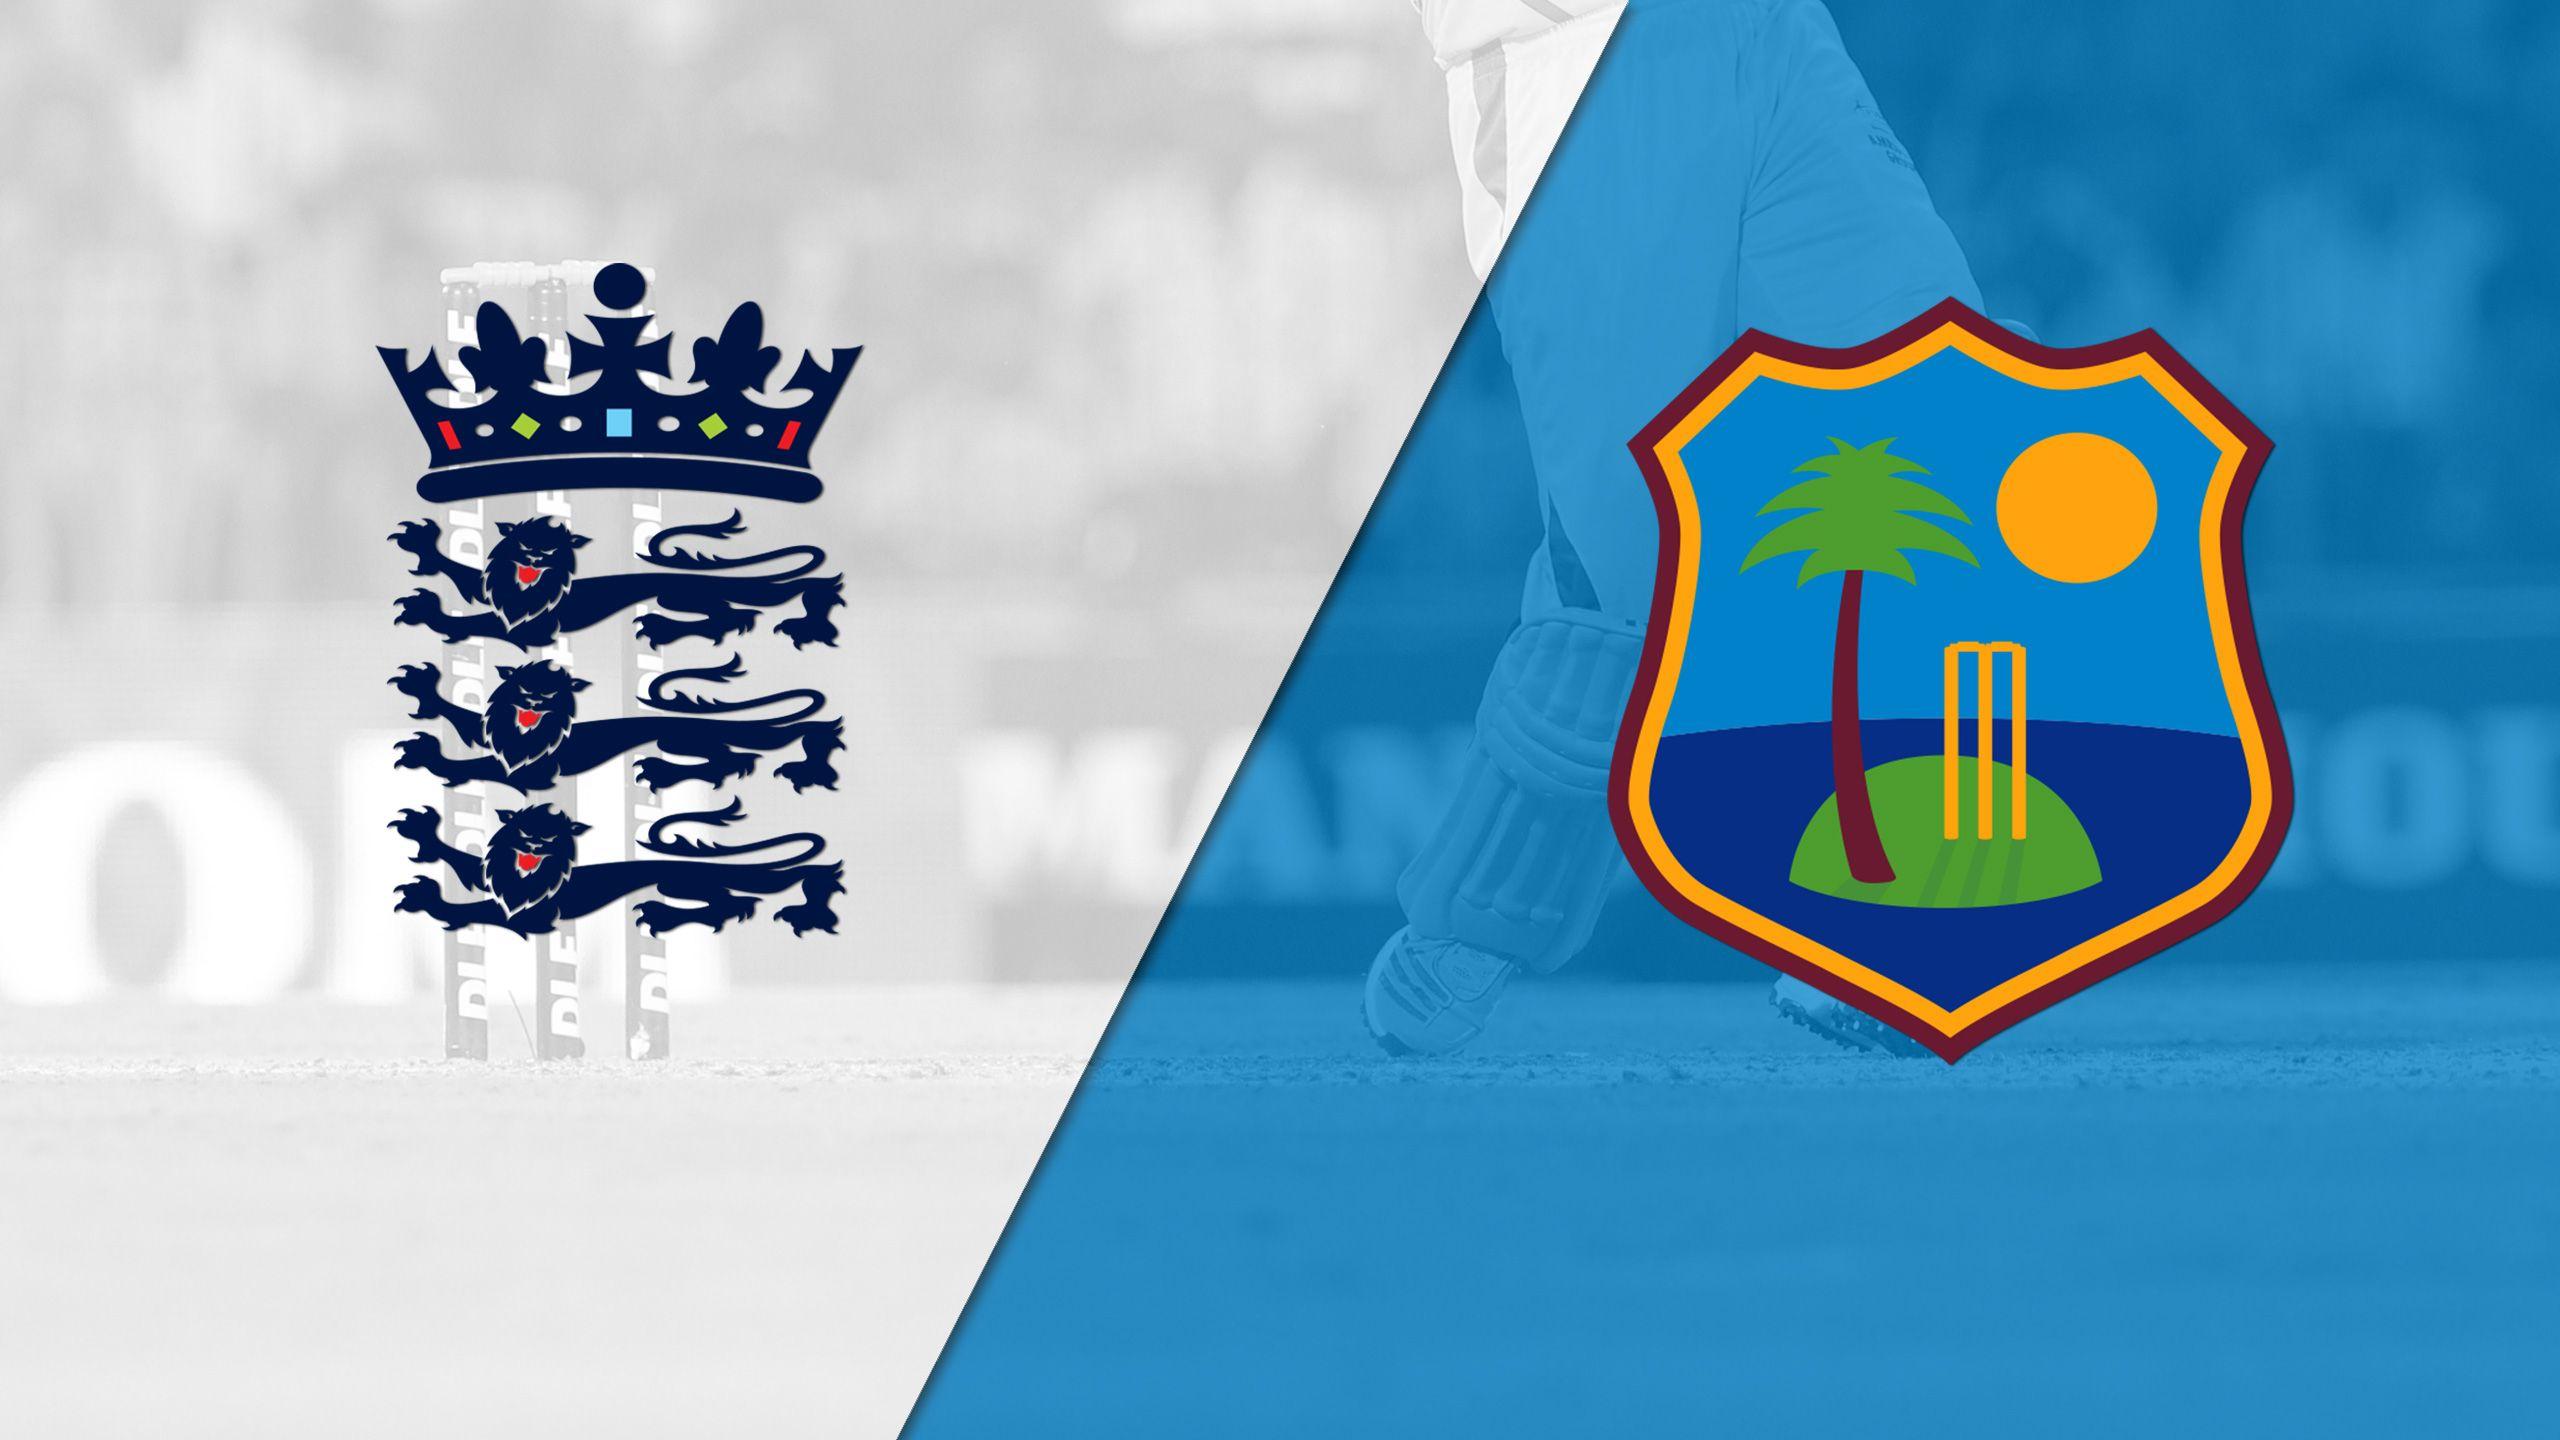 England vs. West Indies (International Cricket)